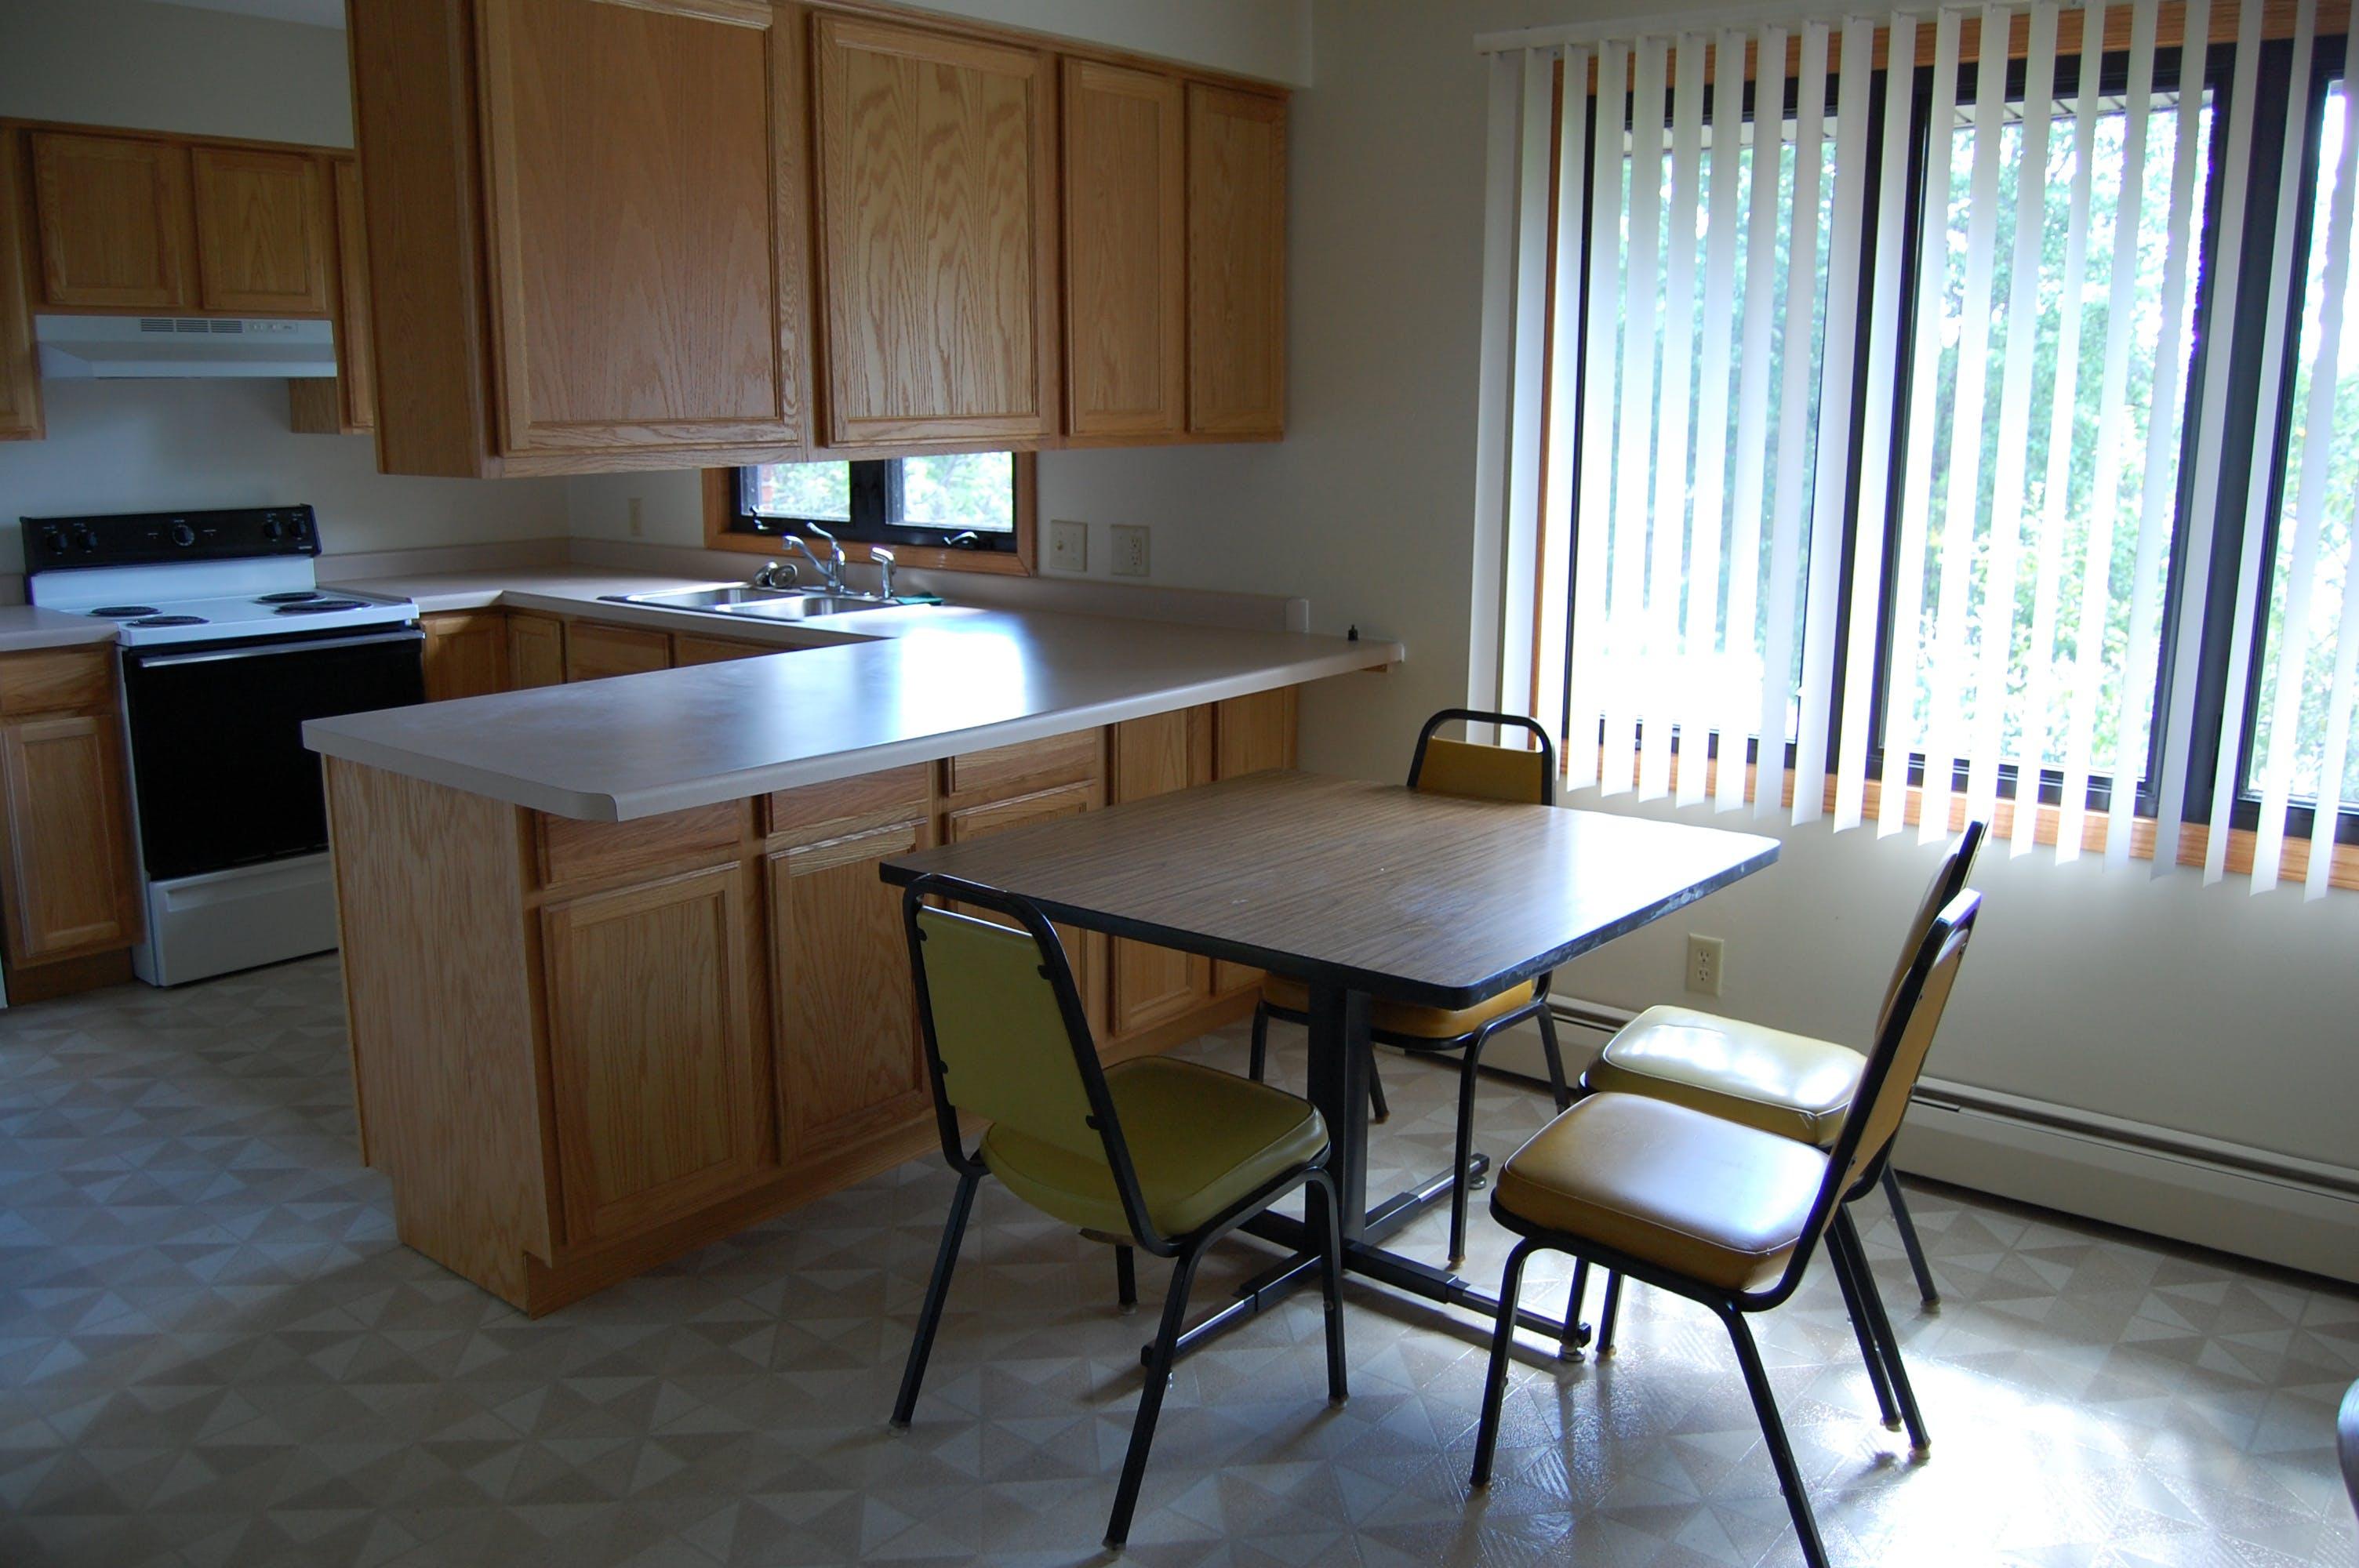 housing-apartments.jpg